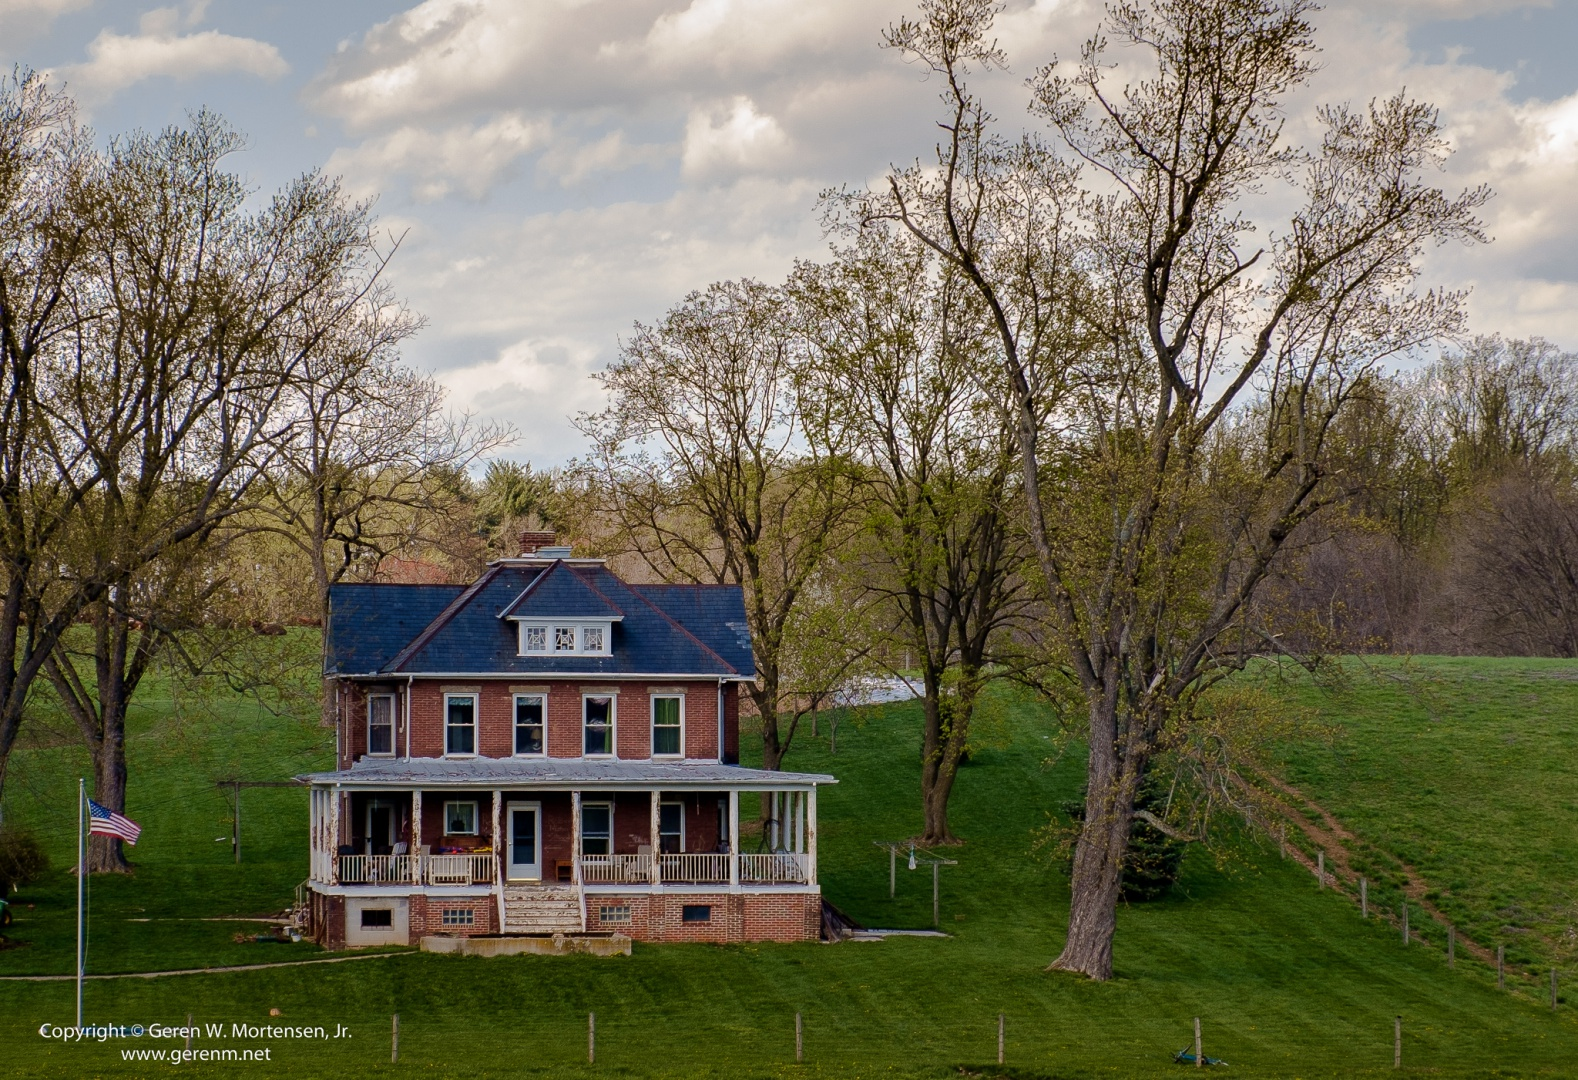 Rural-Carroll-County_April-26-2014_02.jpg